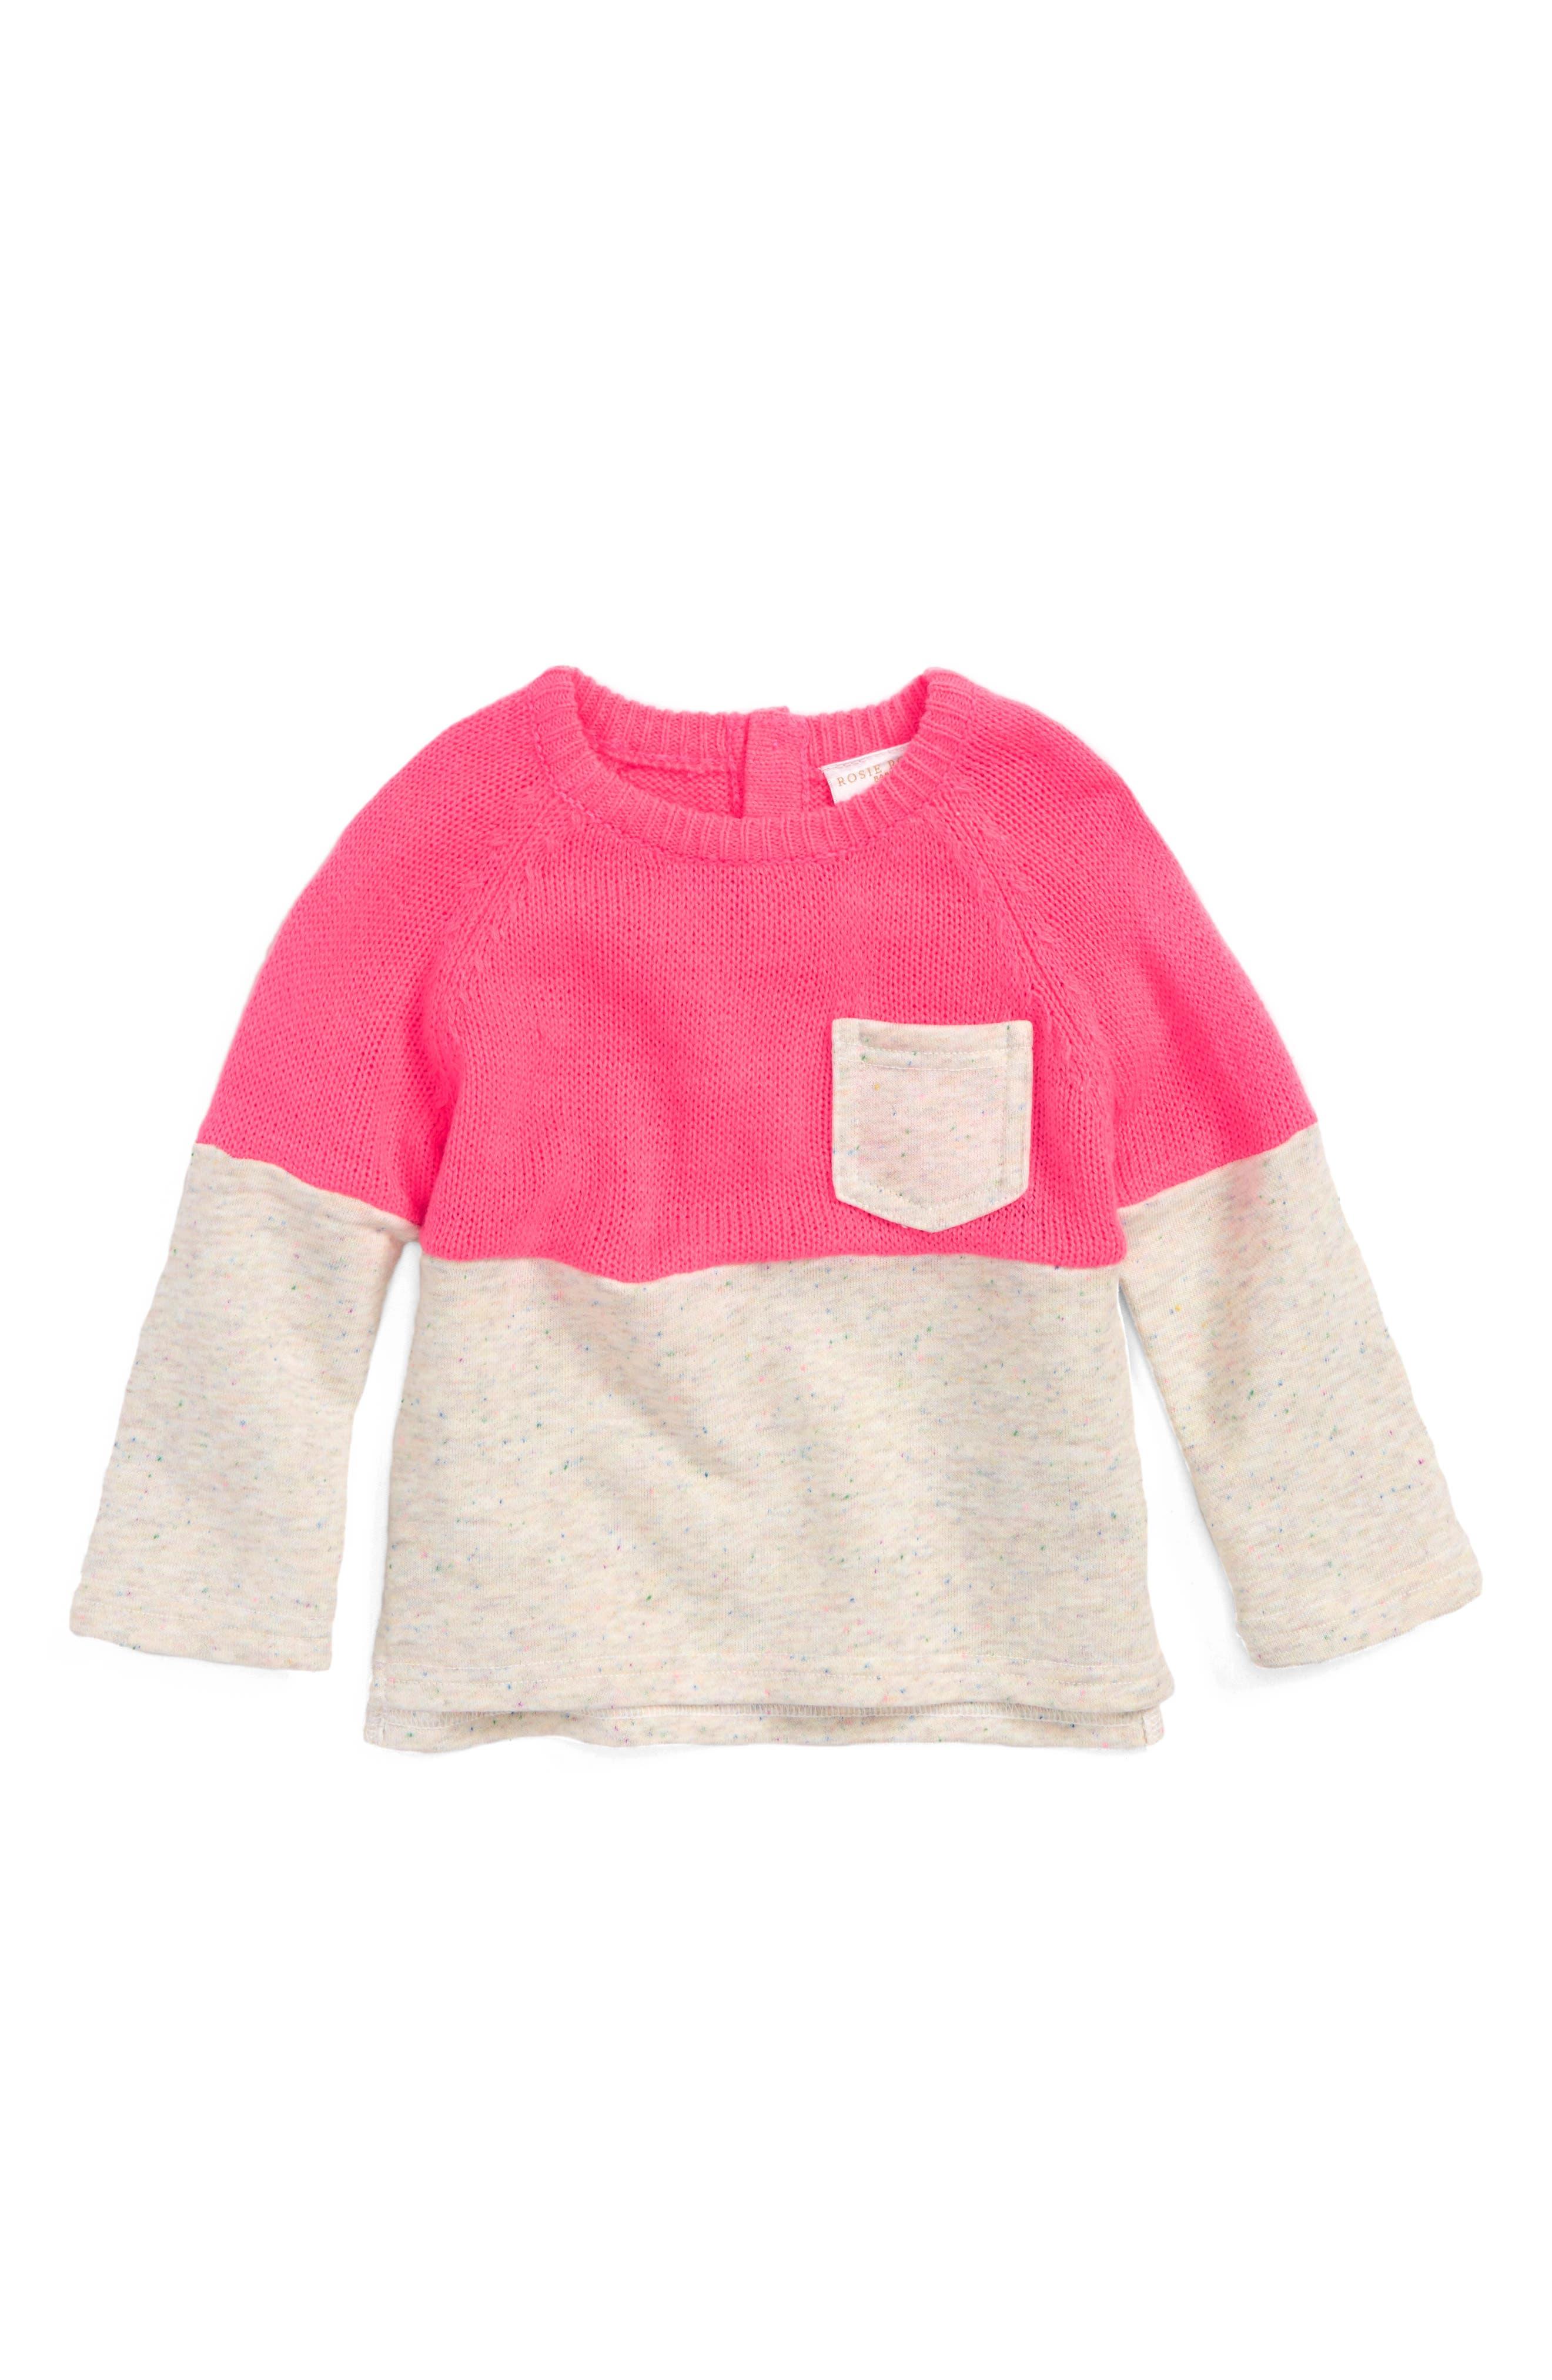 Rosie Pope Mixed Sweater (Baby Girls)